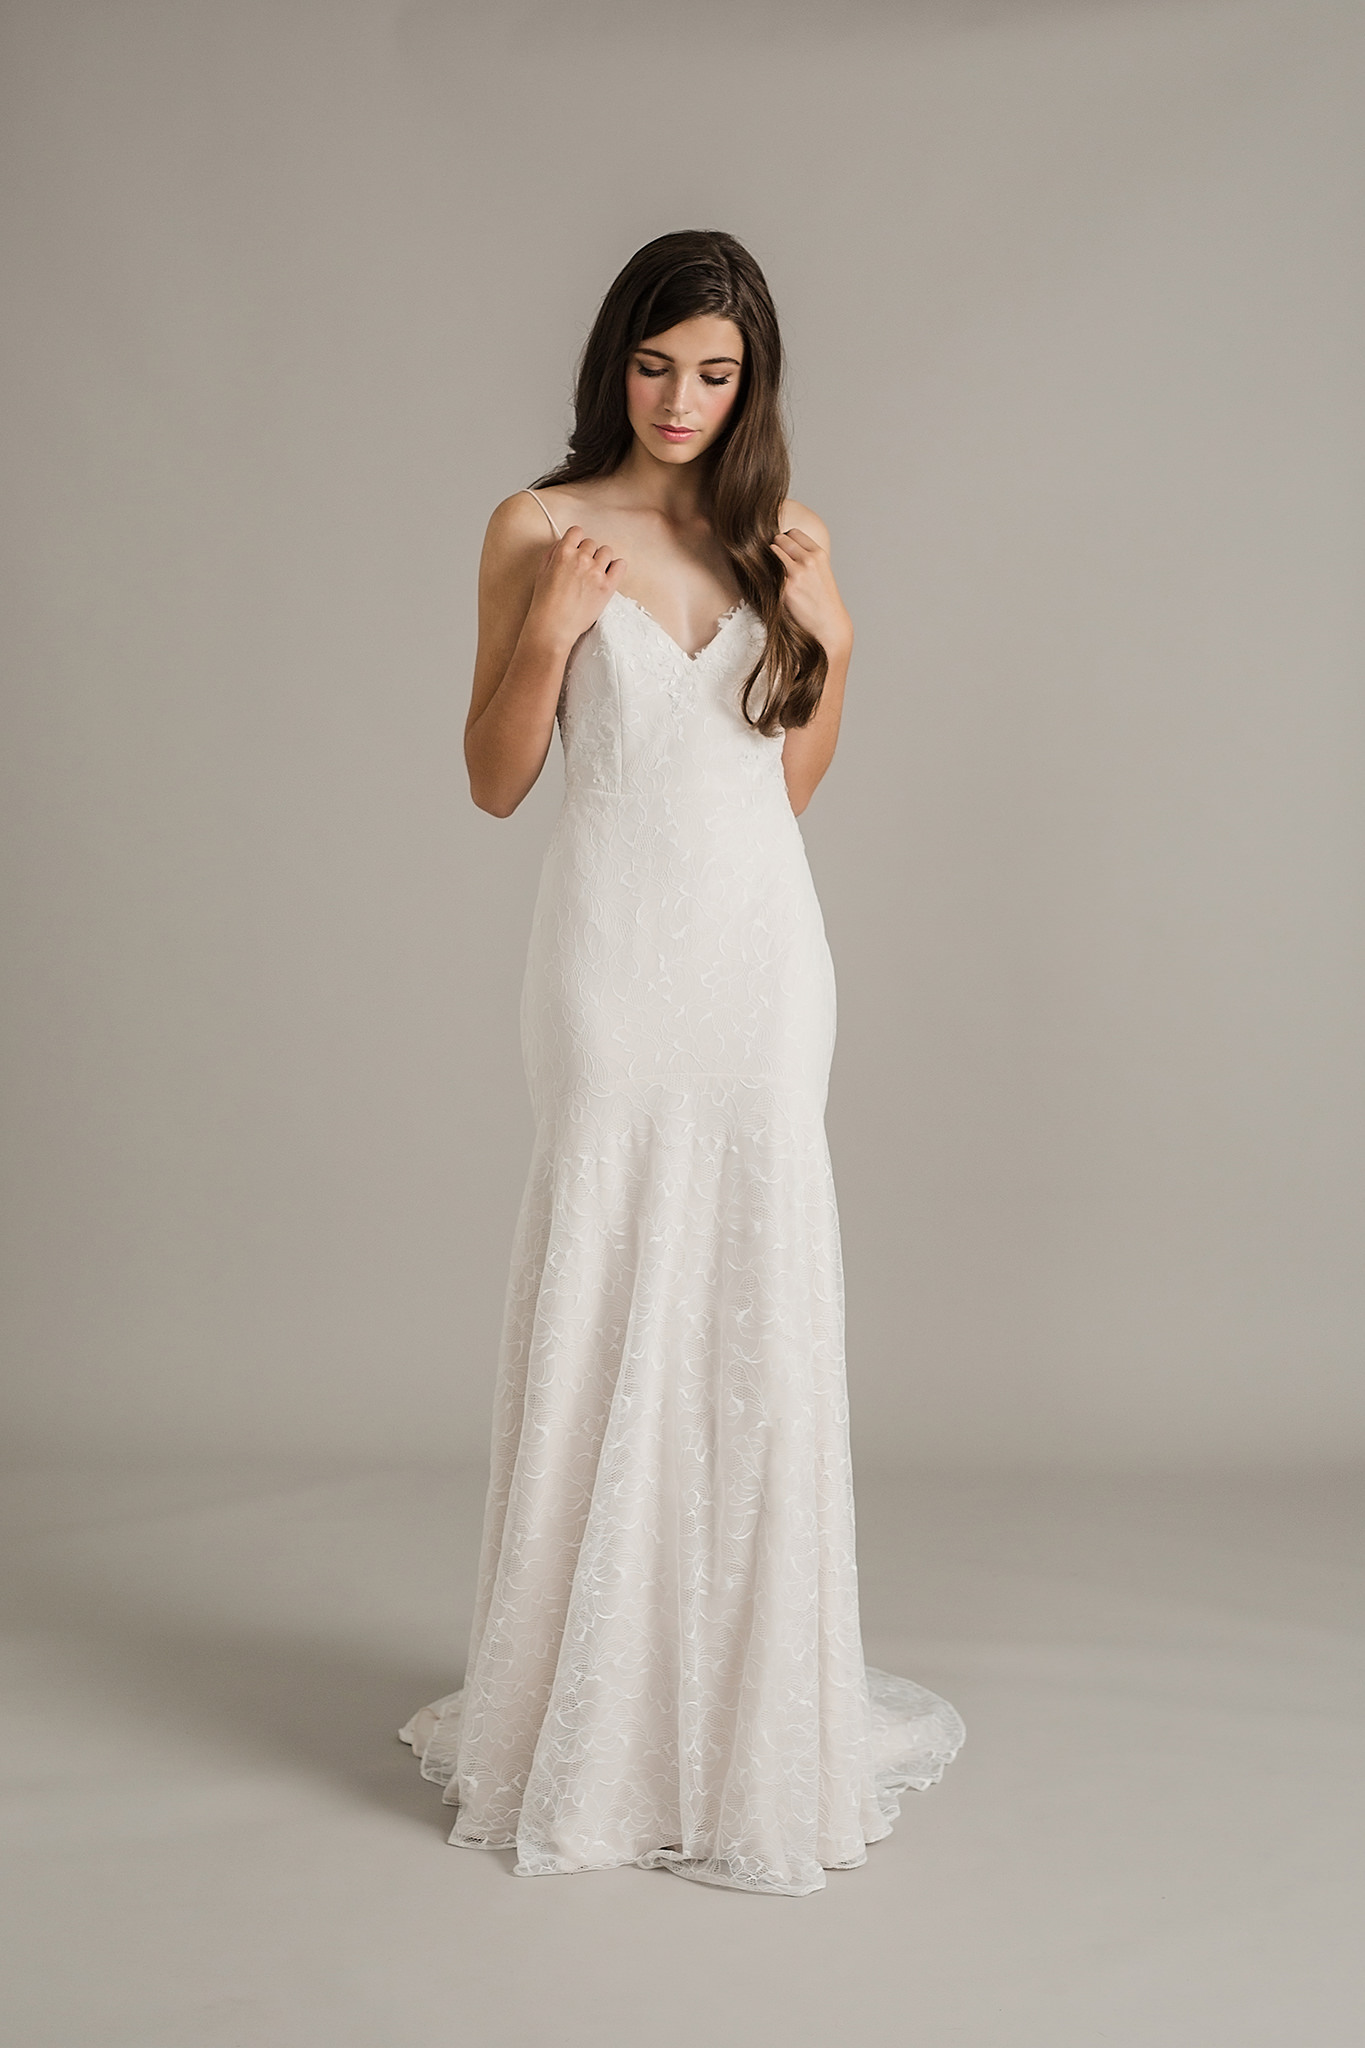 Estelle wedding dress by Sally Eagle